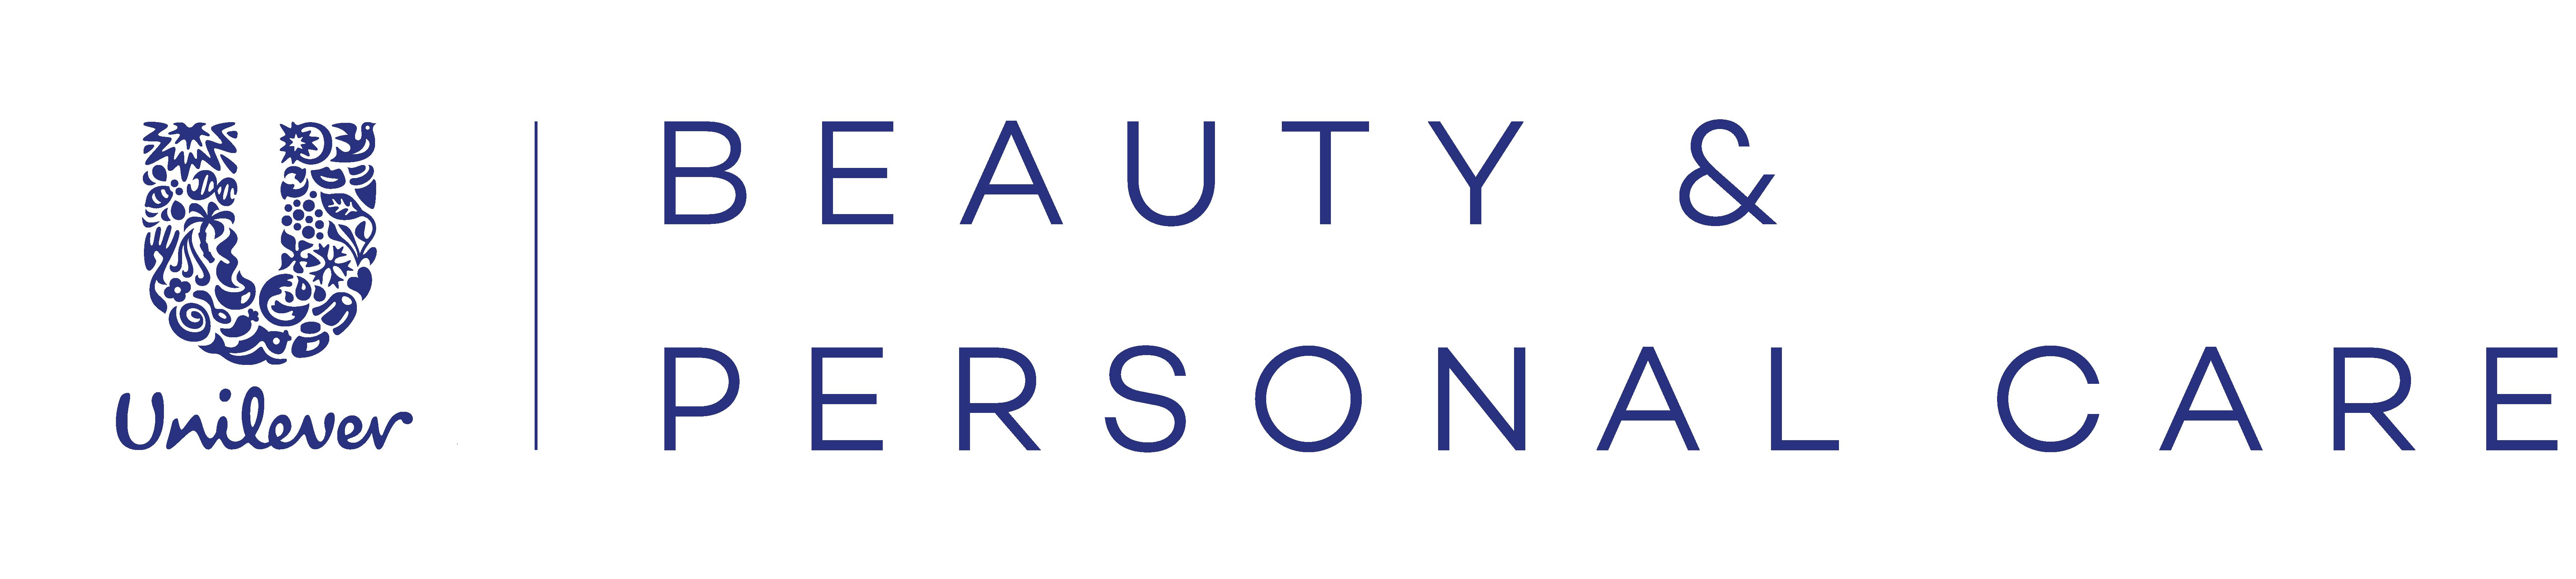 Unilever Friends |Beauty & Personal Care